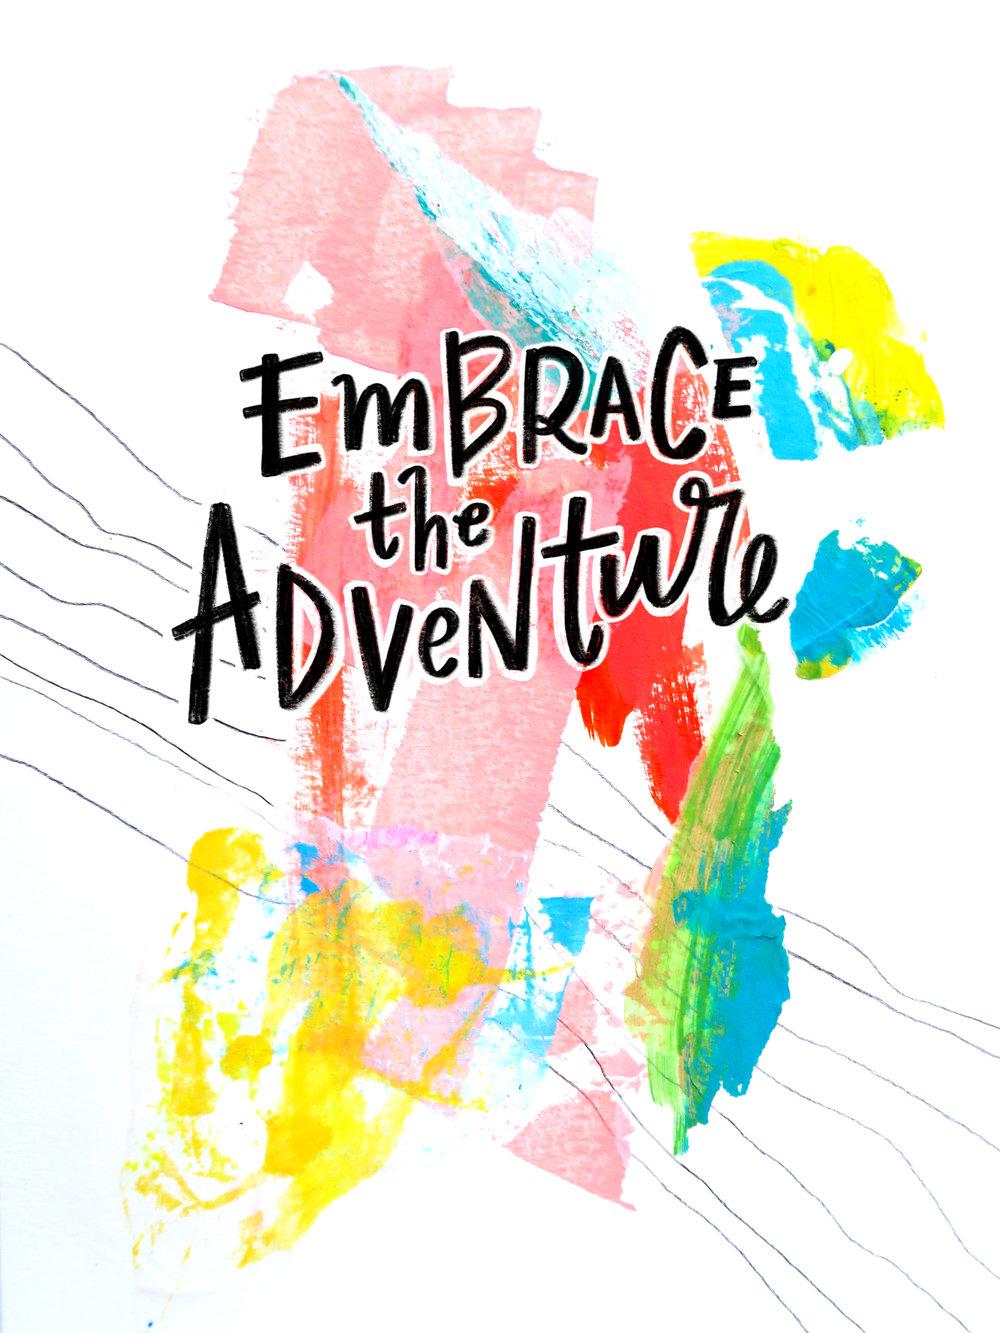 8/14/16: Adventure